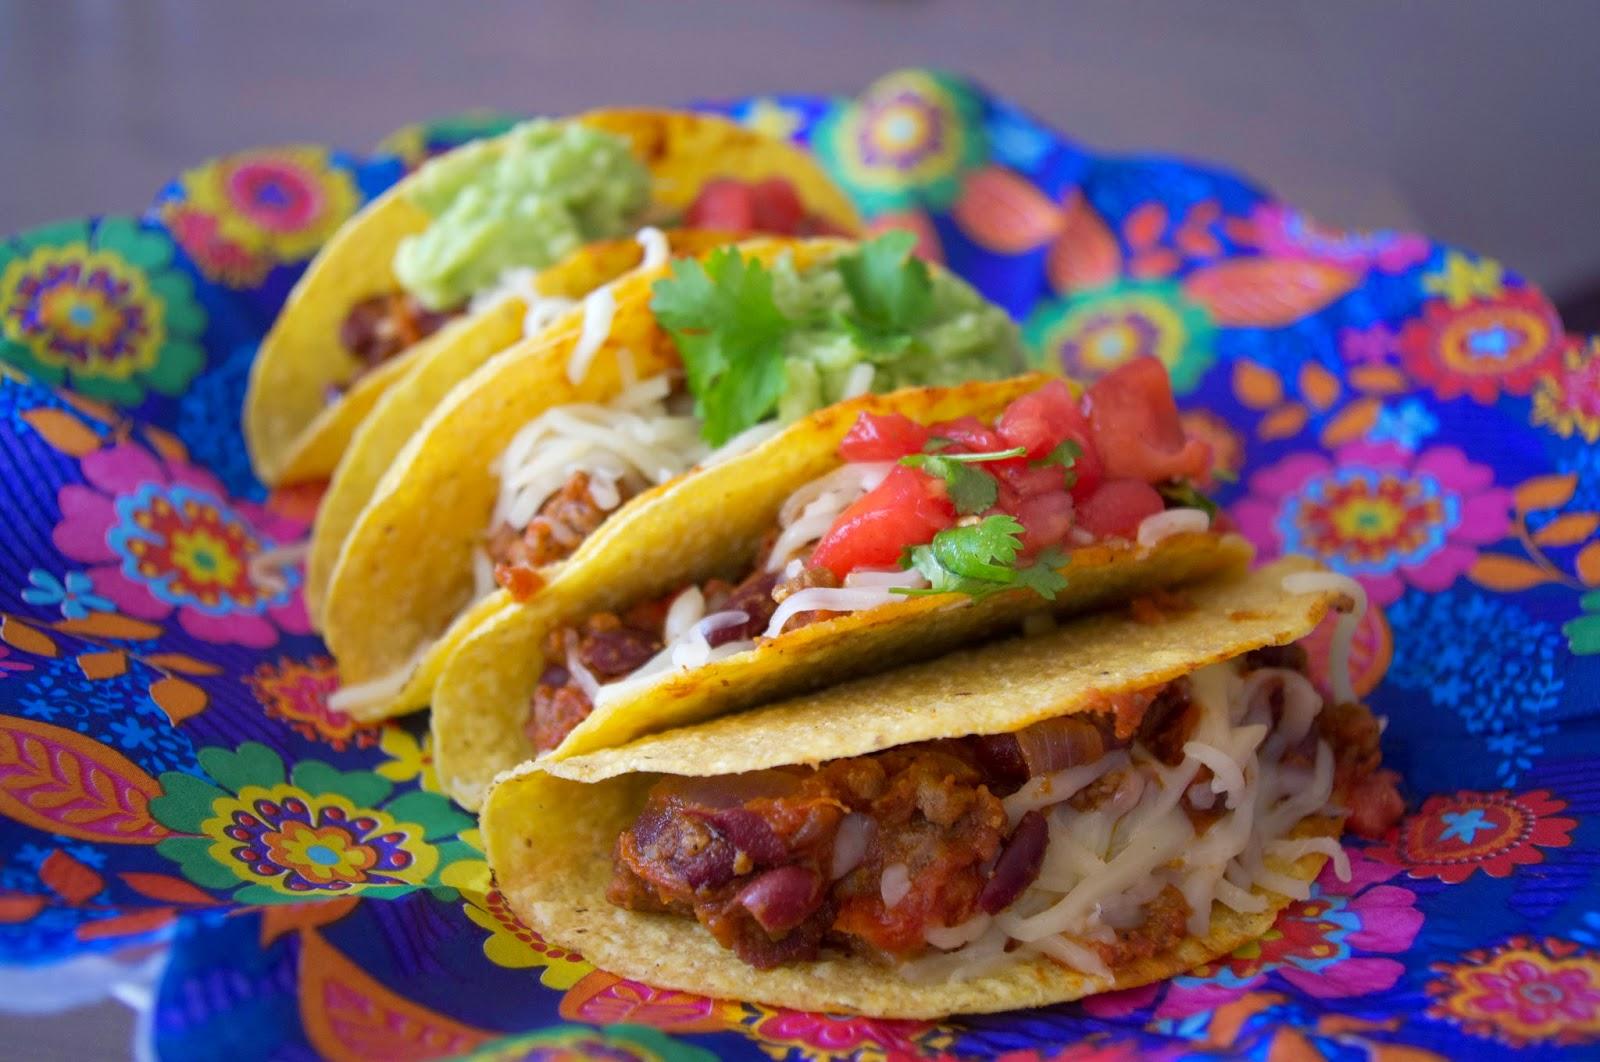 http://mojemenu.blogspot.com/2014/10/uczta-meksykanska-tacos.html